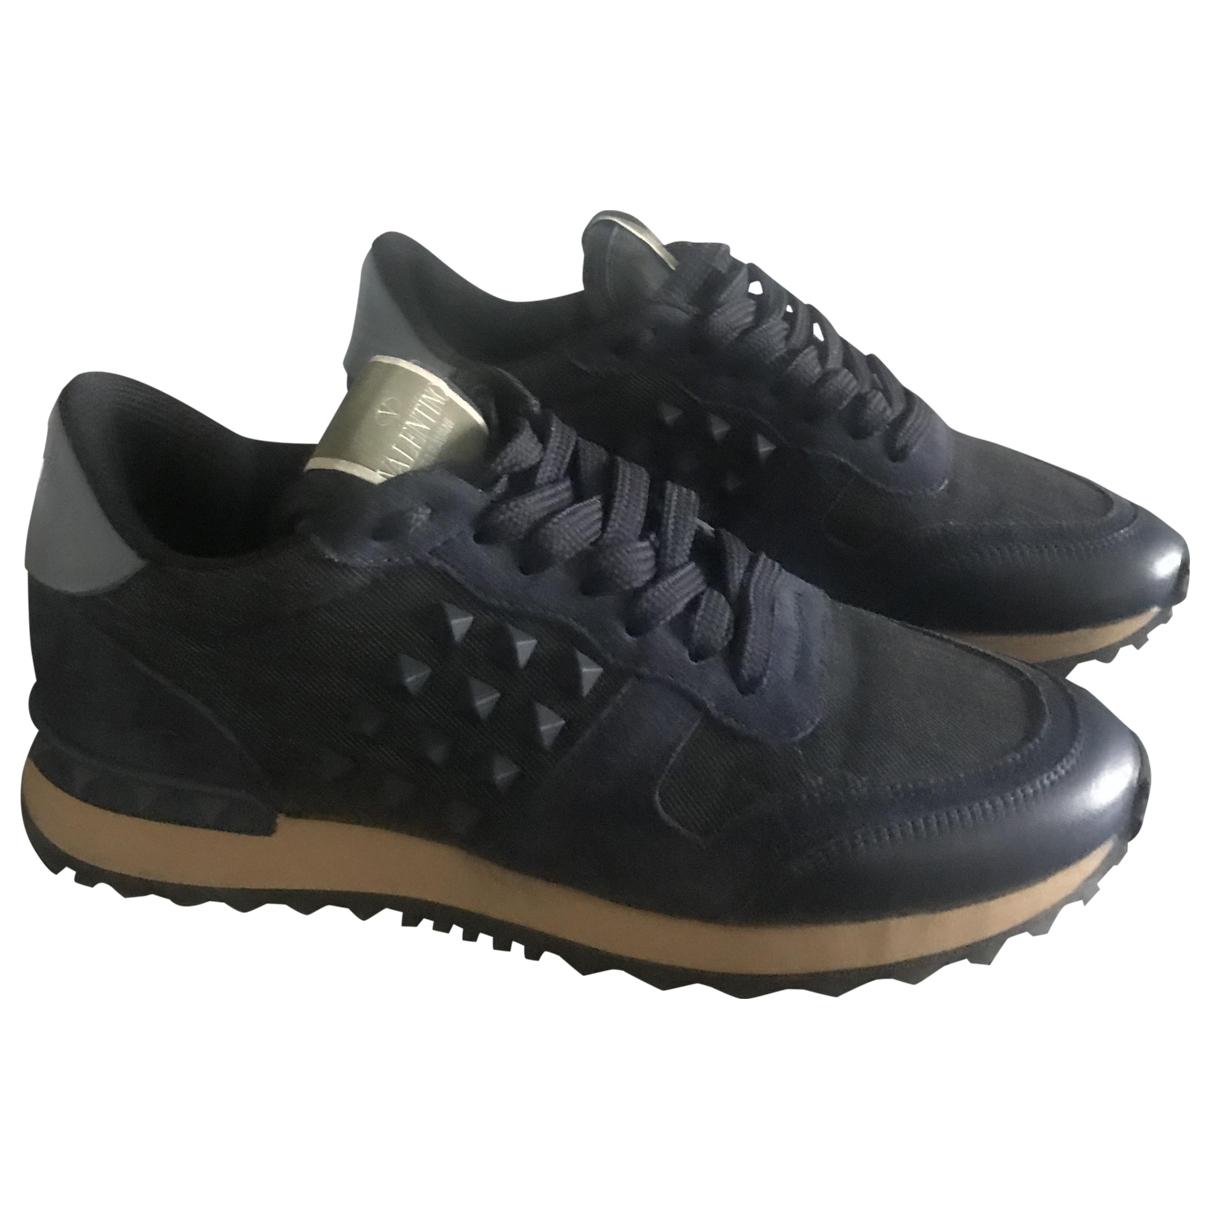 Valentino Garavani Rockstud Navy Leather Trainers for Women 37 EU